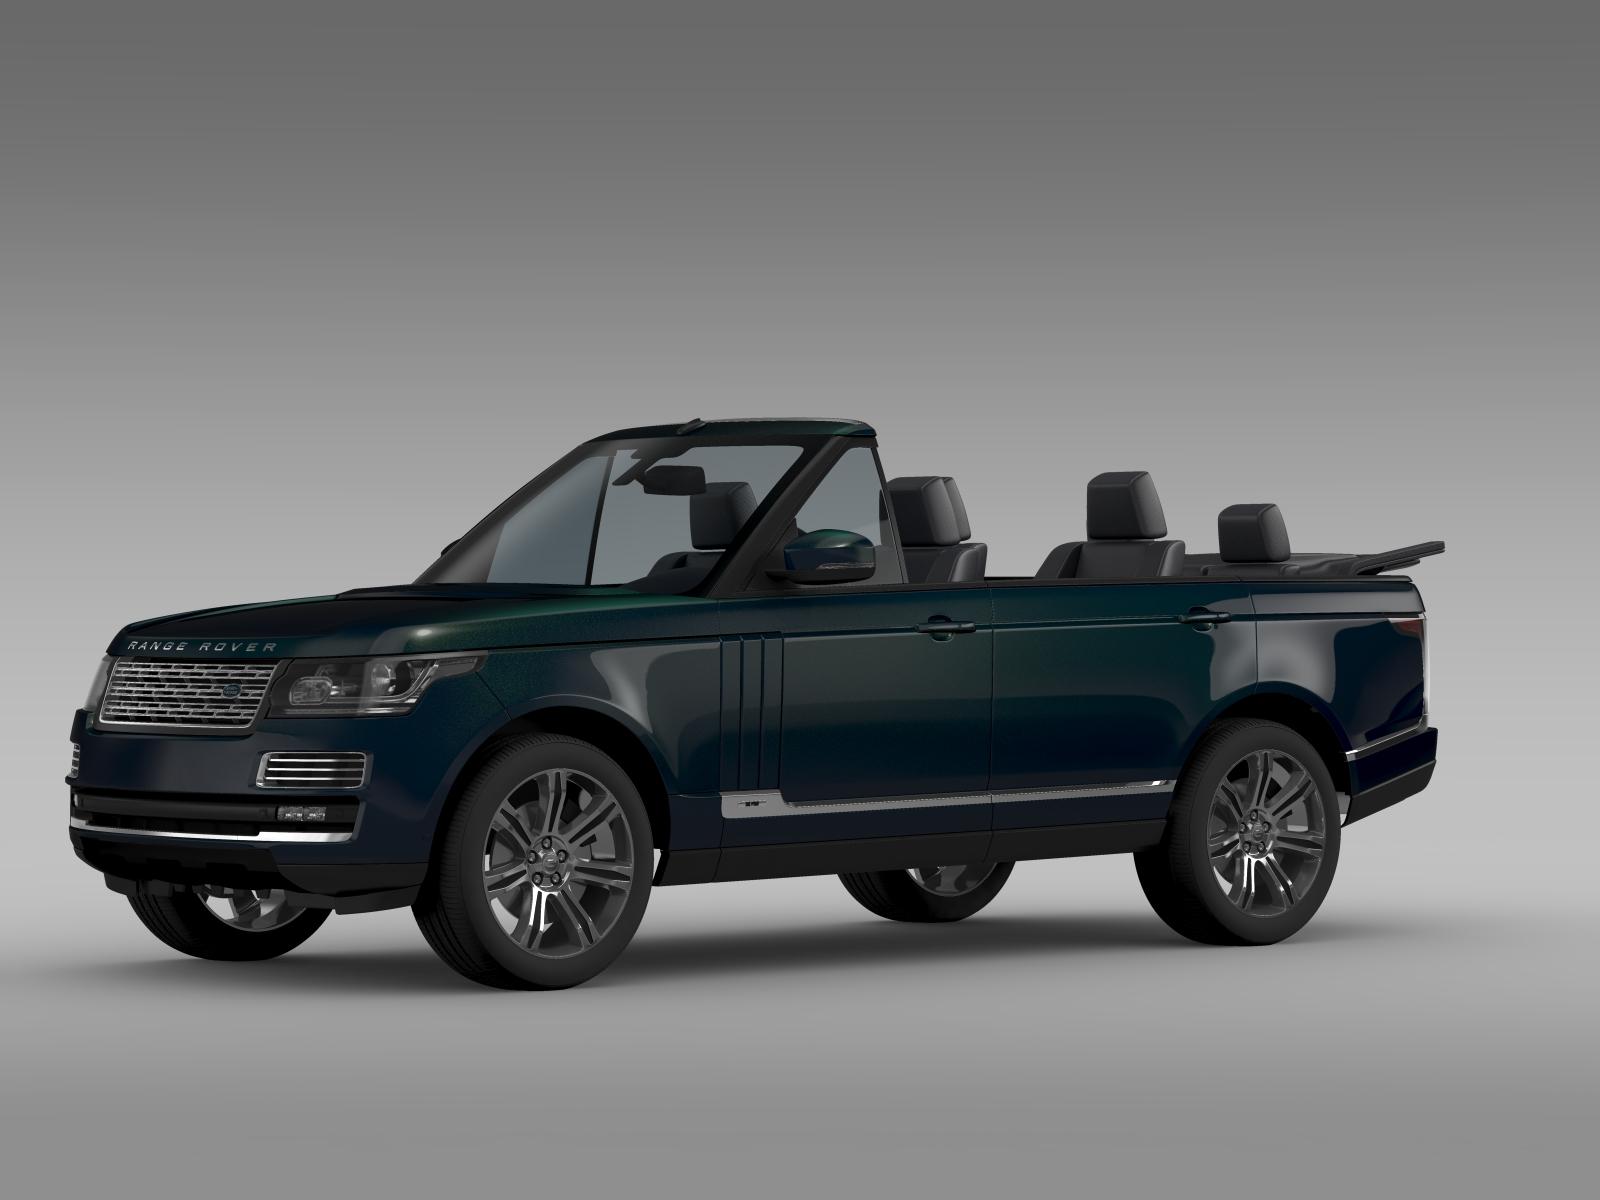 range rover autobiography black lwb cabrio l405 20 3d. Black Bedroom Furniture Sets. Home Design Ideas